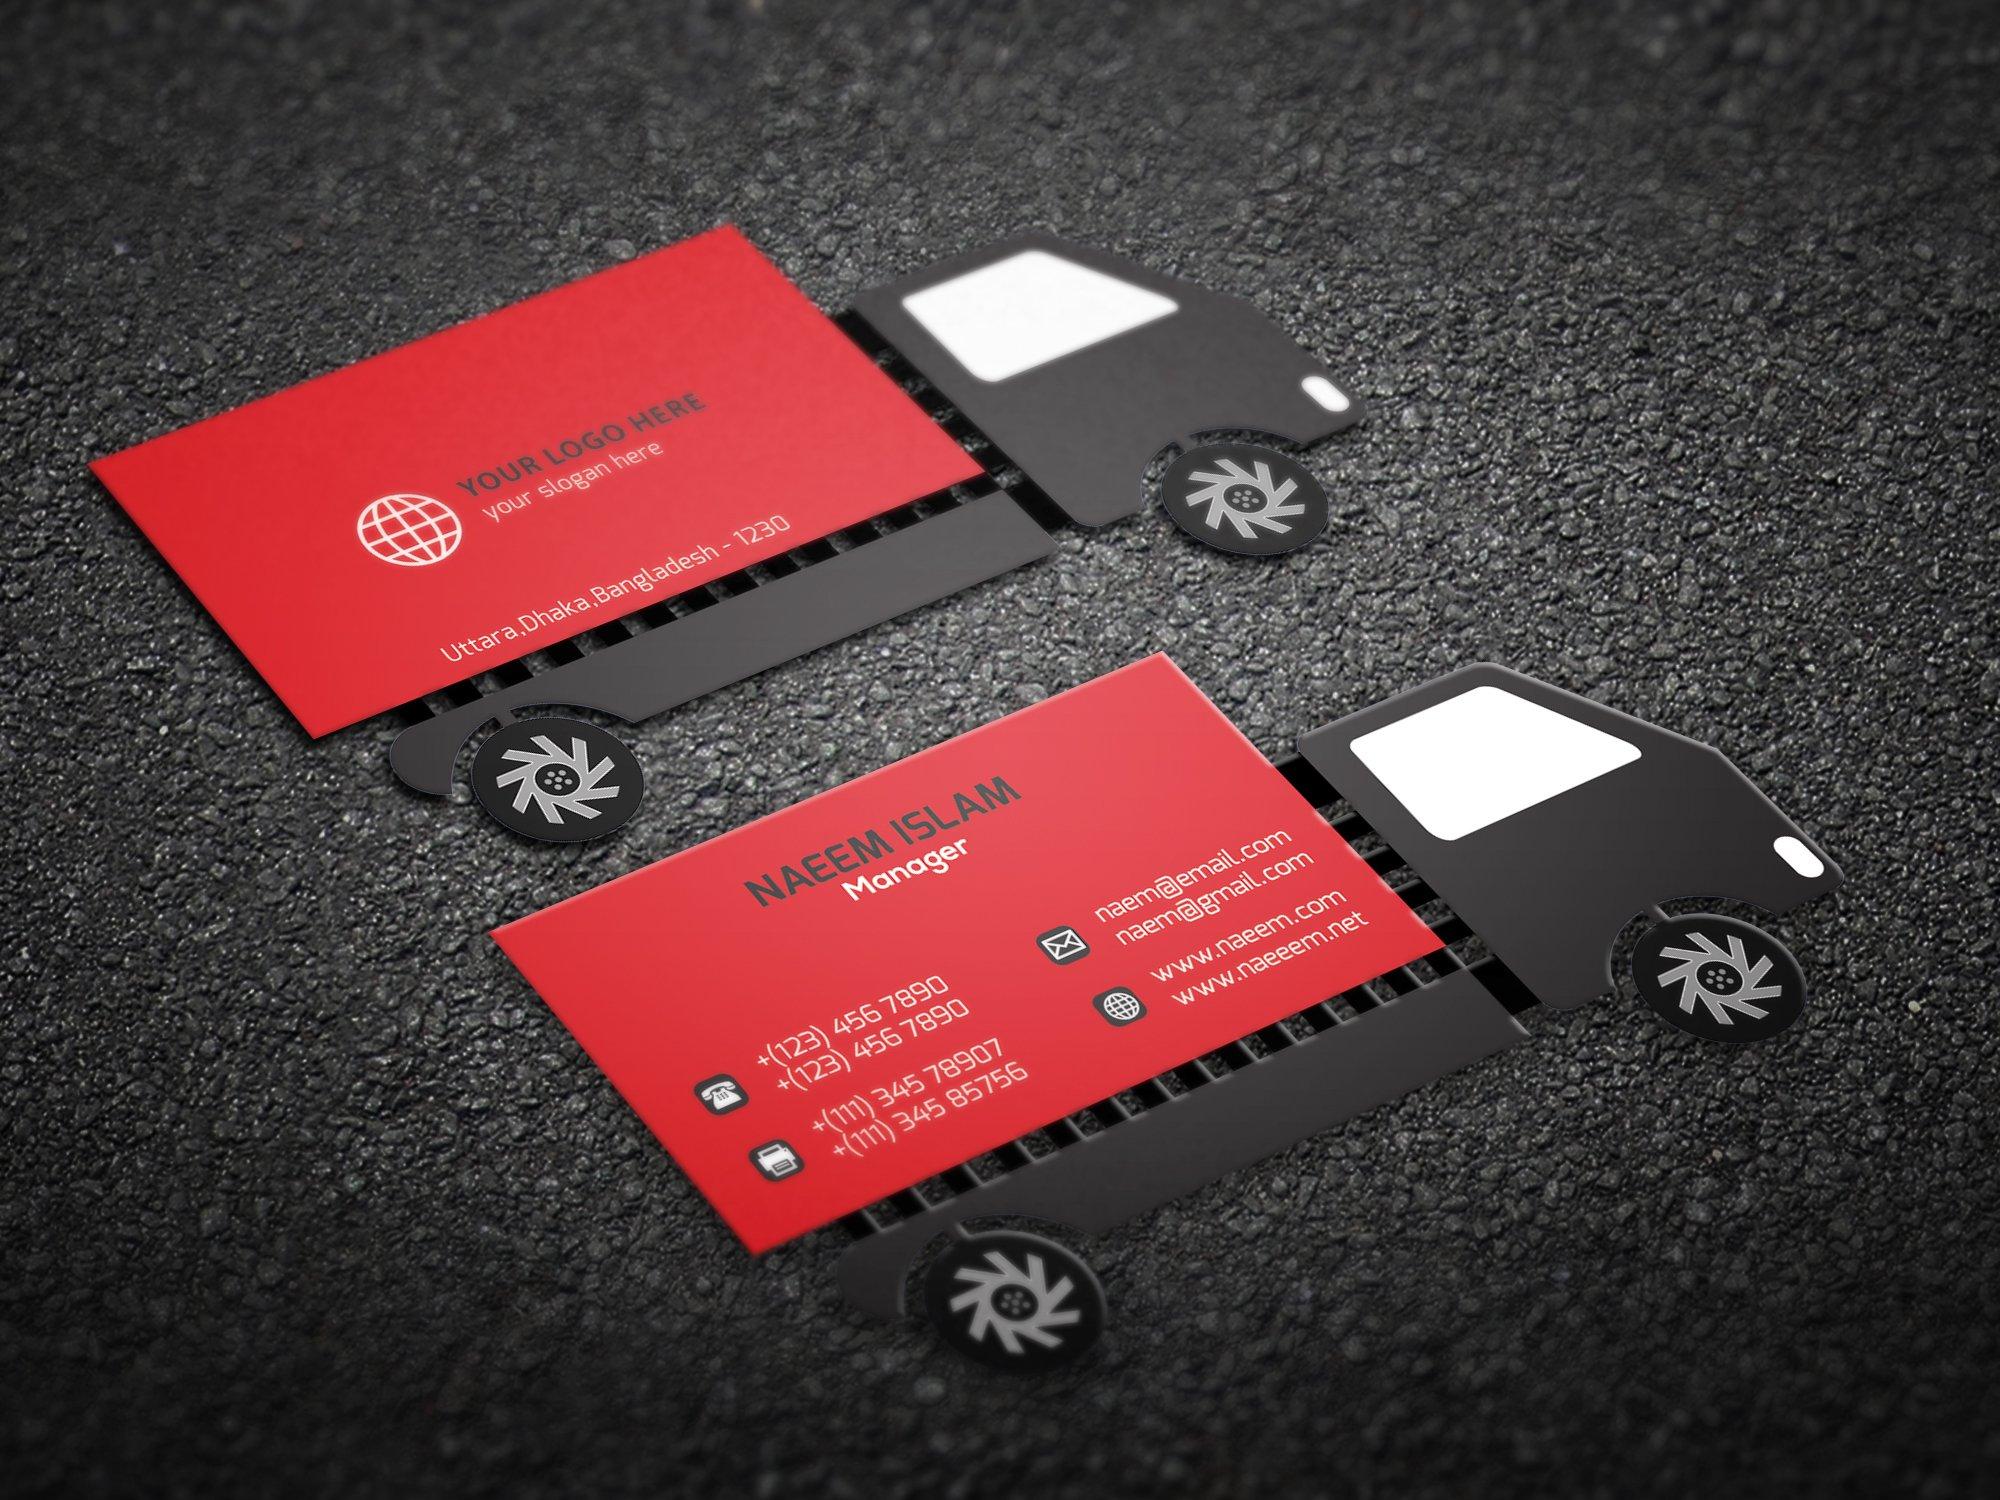 23 tarjetas de presentaci n que impactar n a tus clientes - Disenos para tarjetas ...